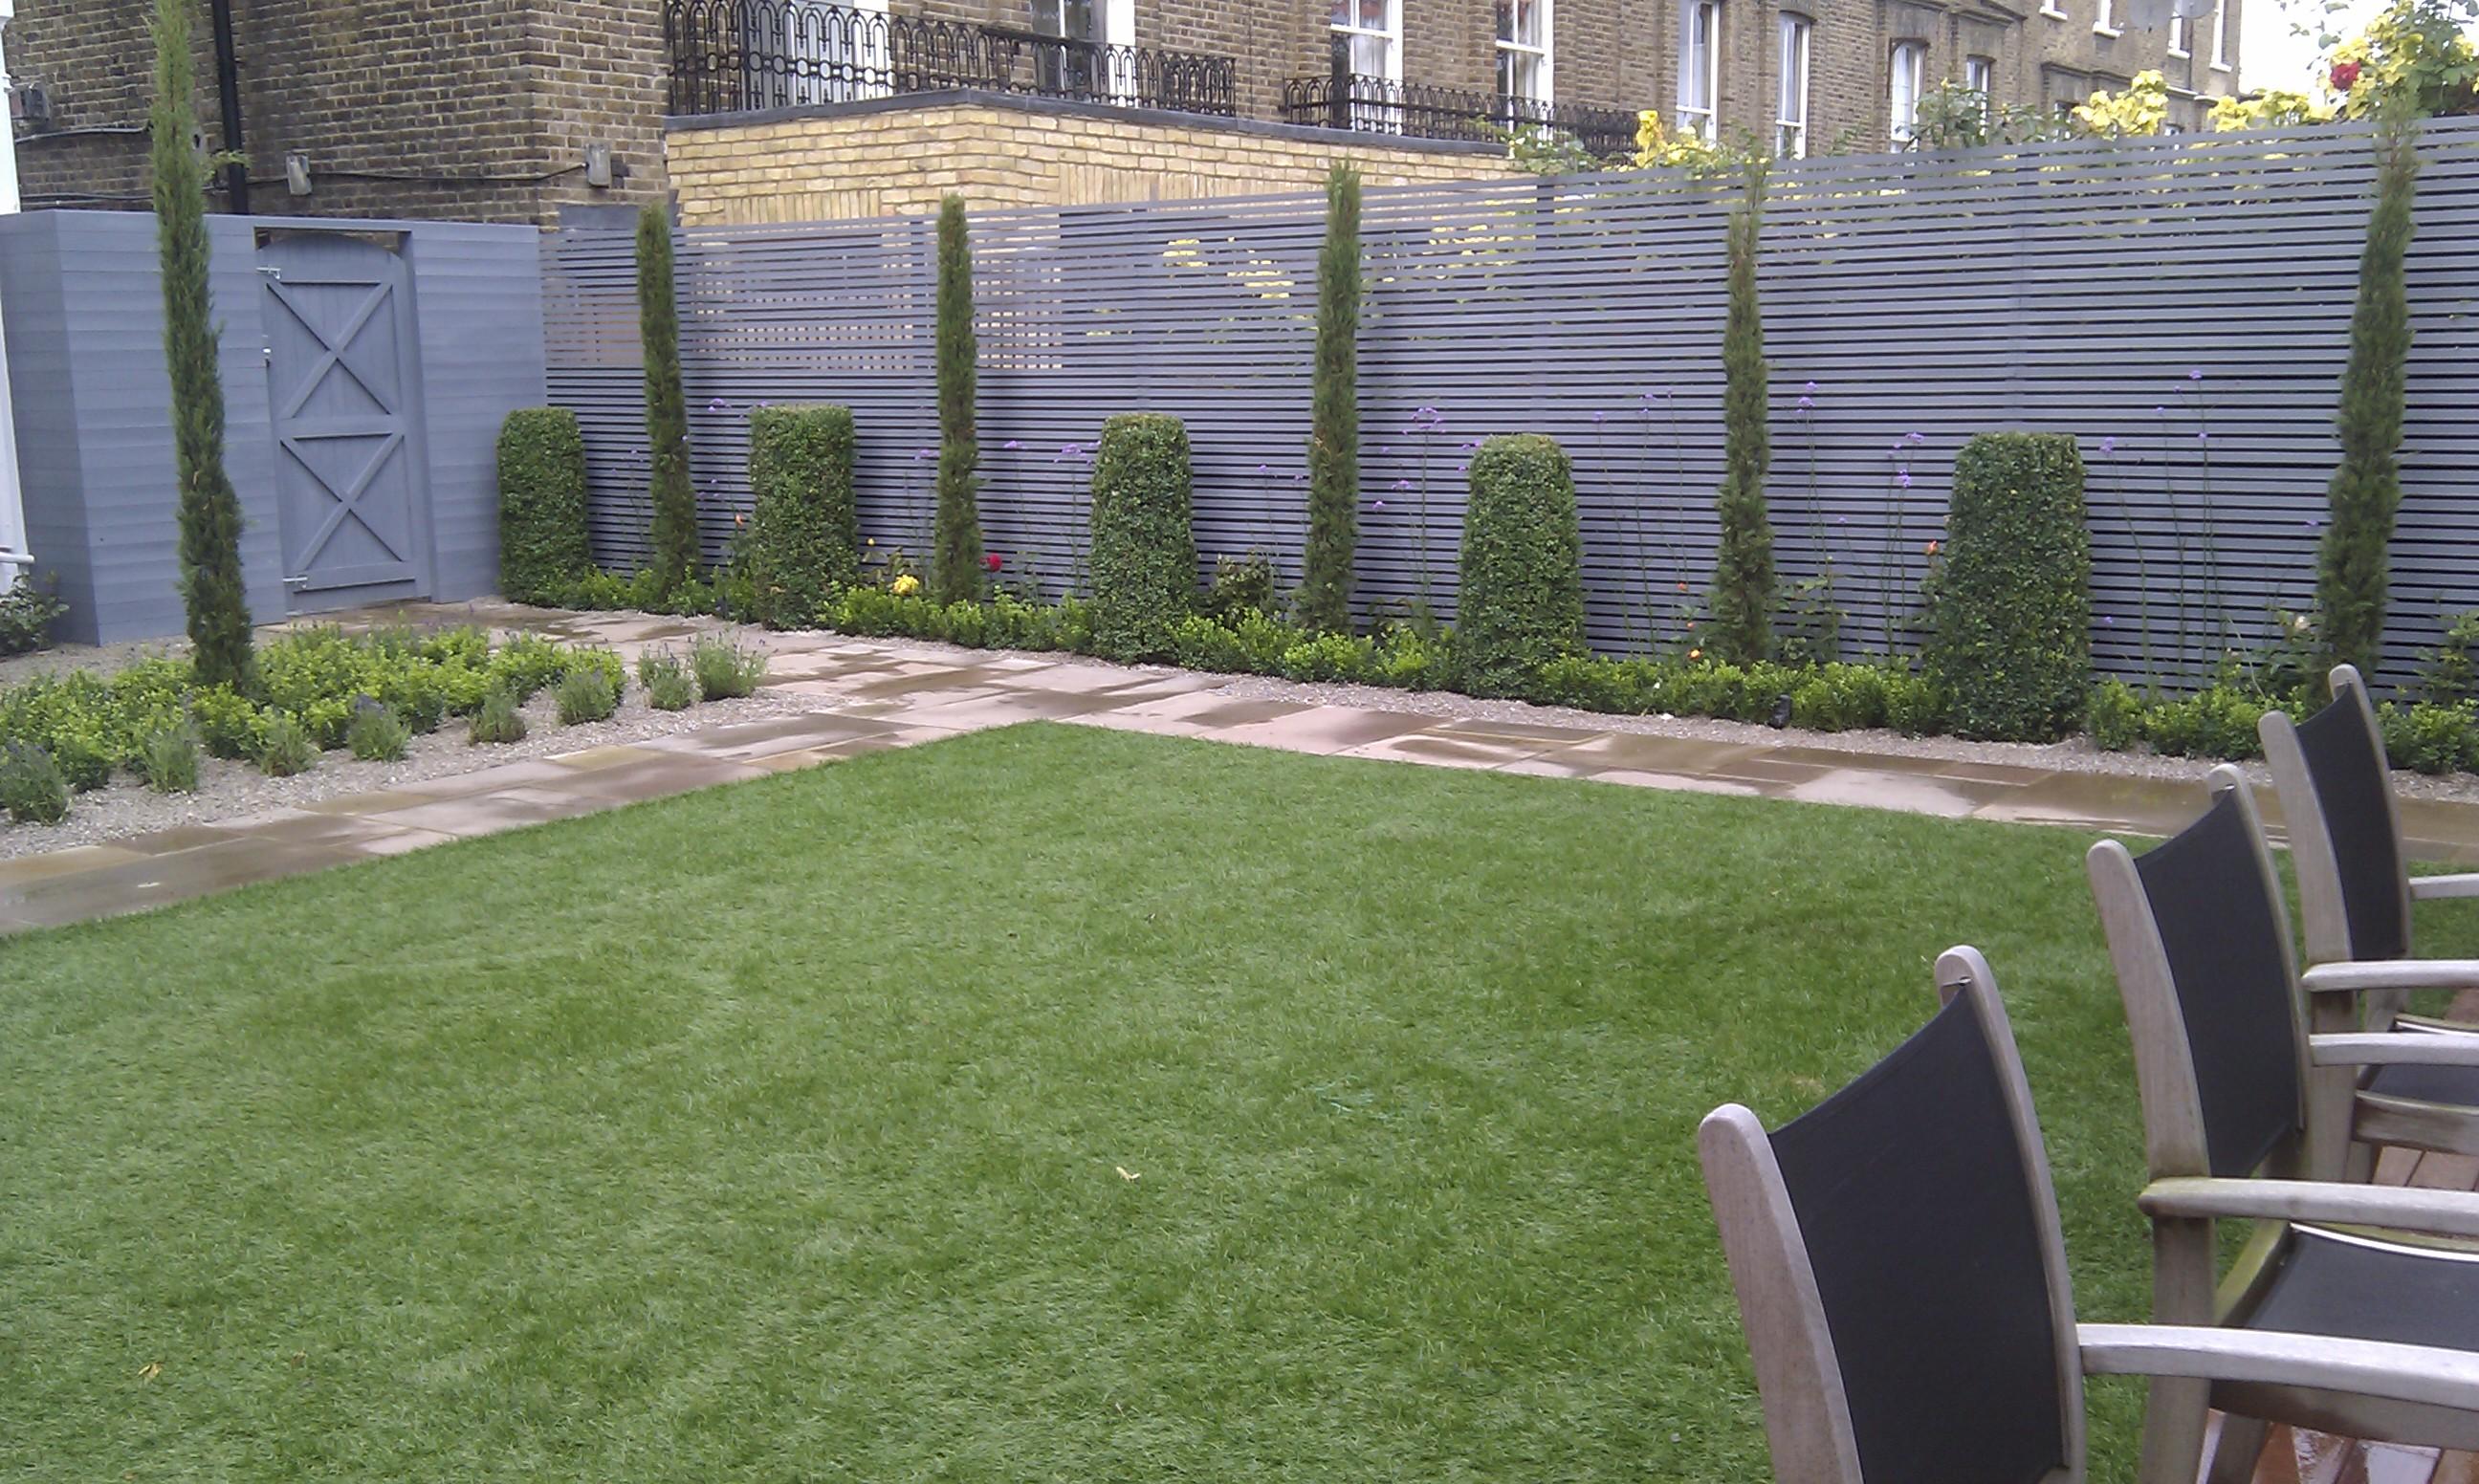 modern garden design london slatted grey privacy screen sandstone paving easy grass balau hardwood decking (11)